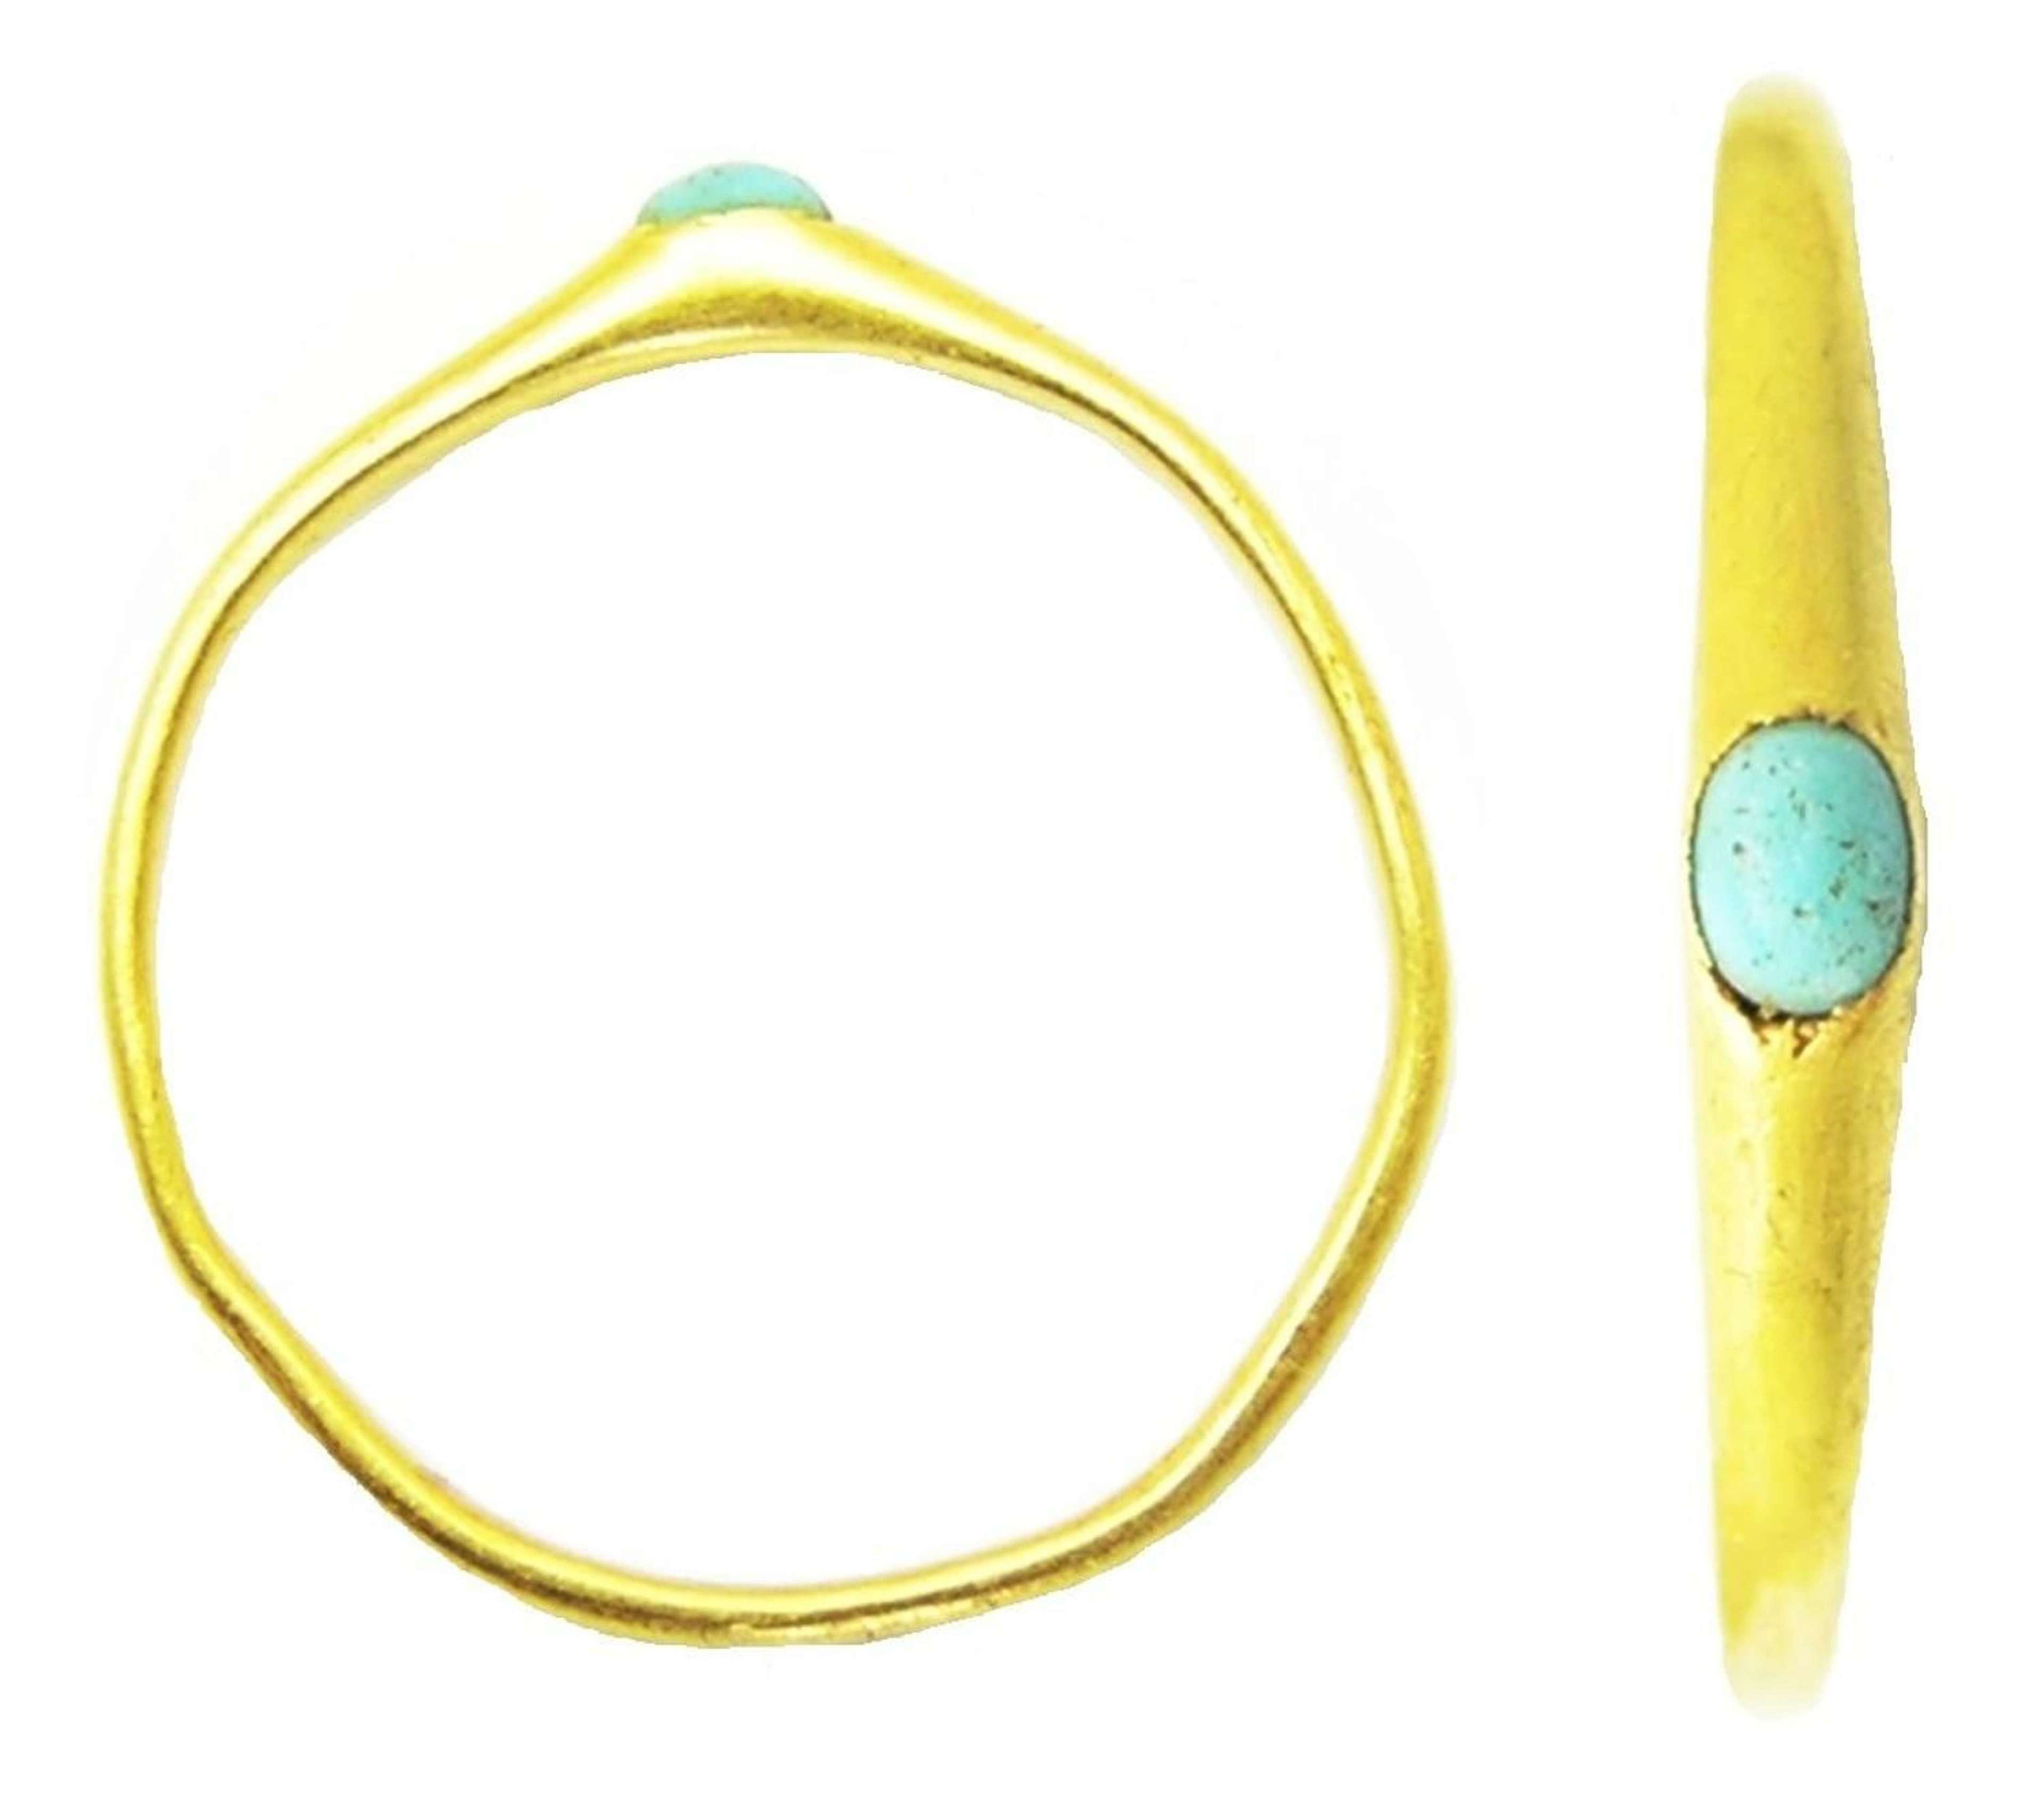 Medieval gold stirrup ring turquoise gemstone